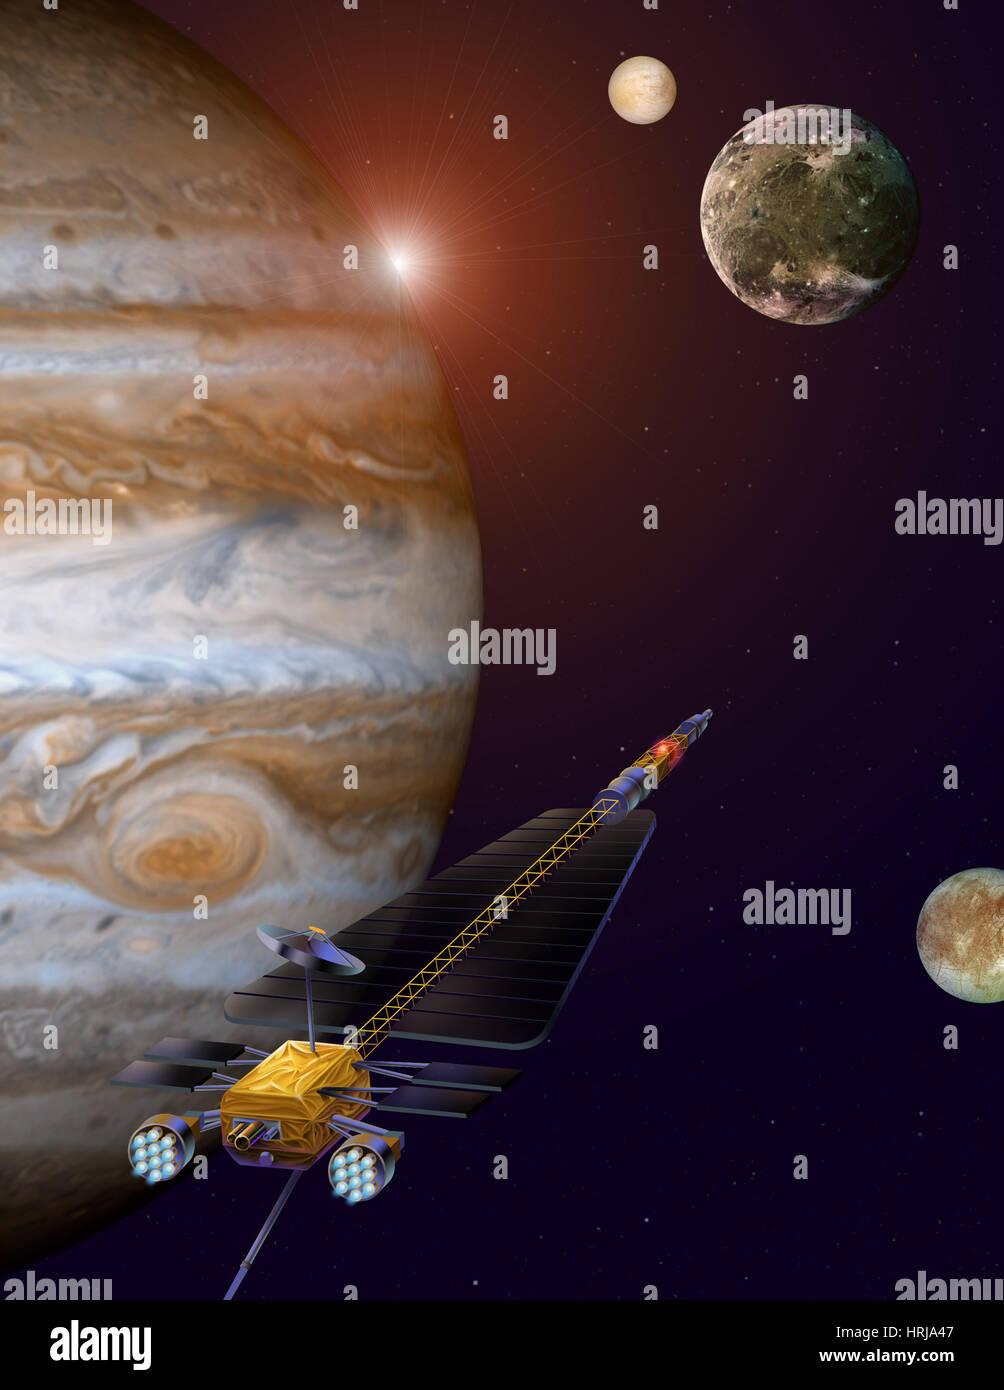 Jupiter Icy Moons Orbiter, artista del concetto Immagini Stock